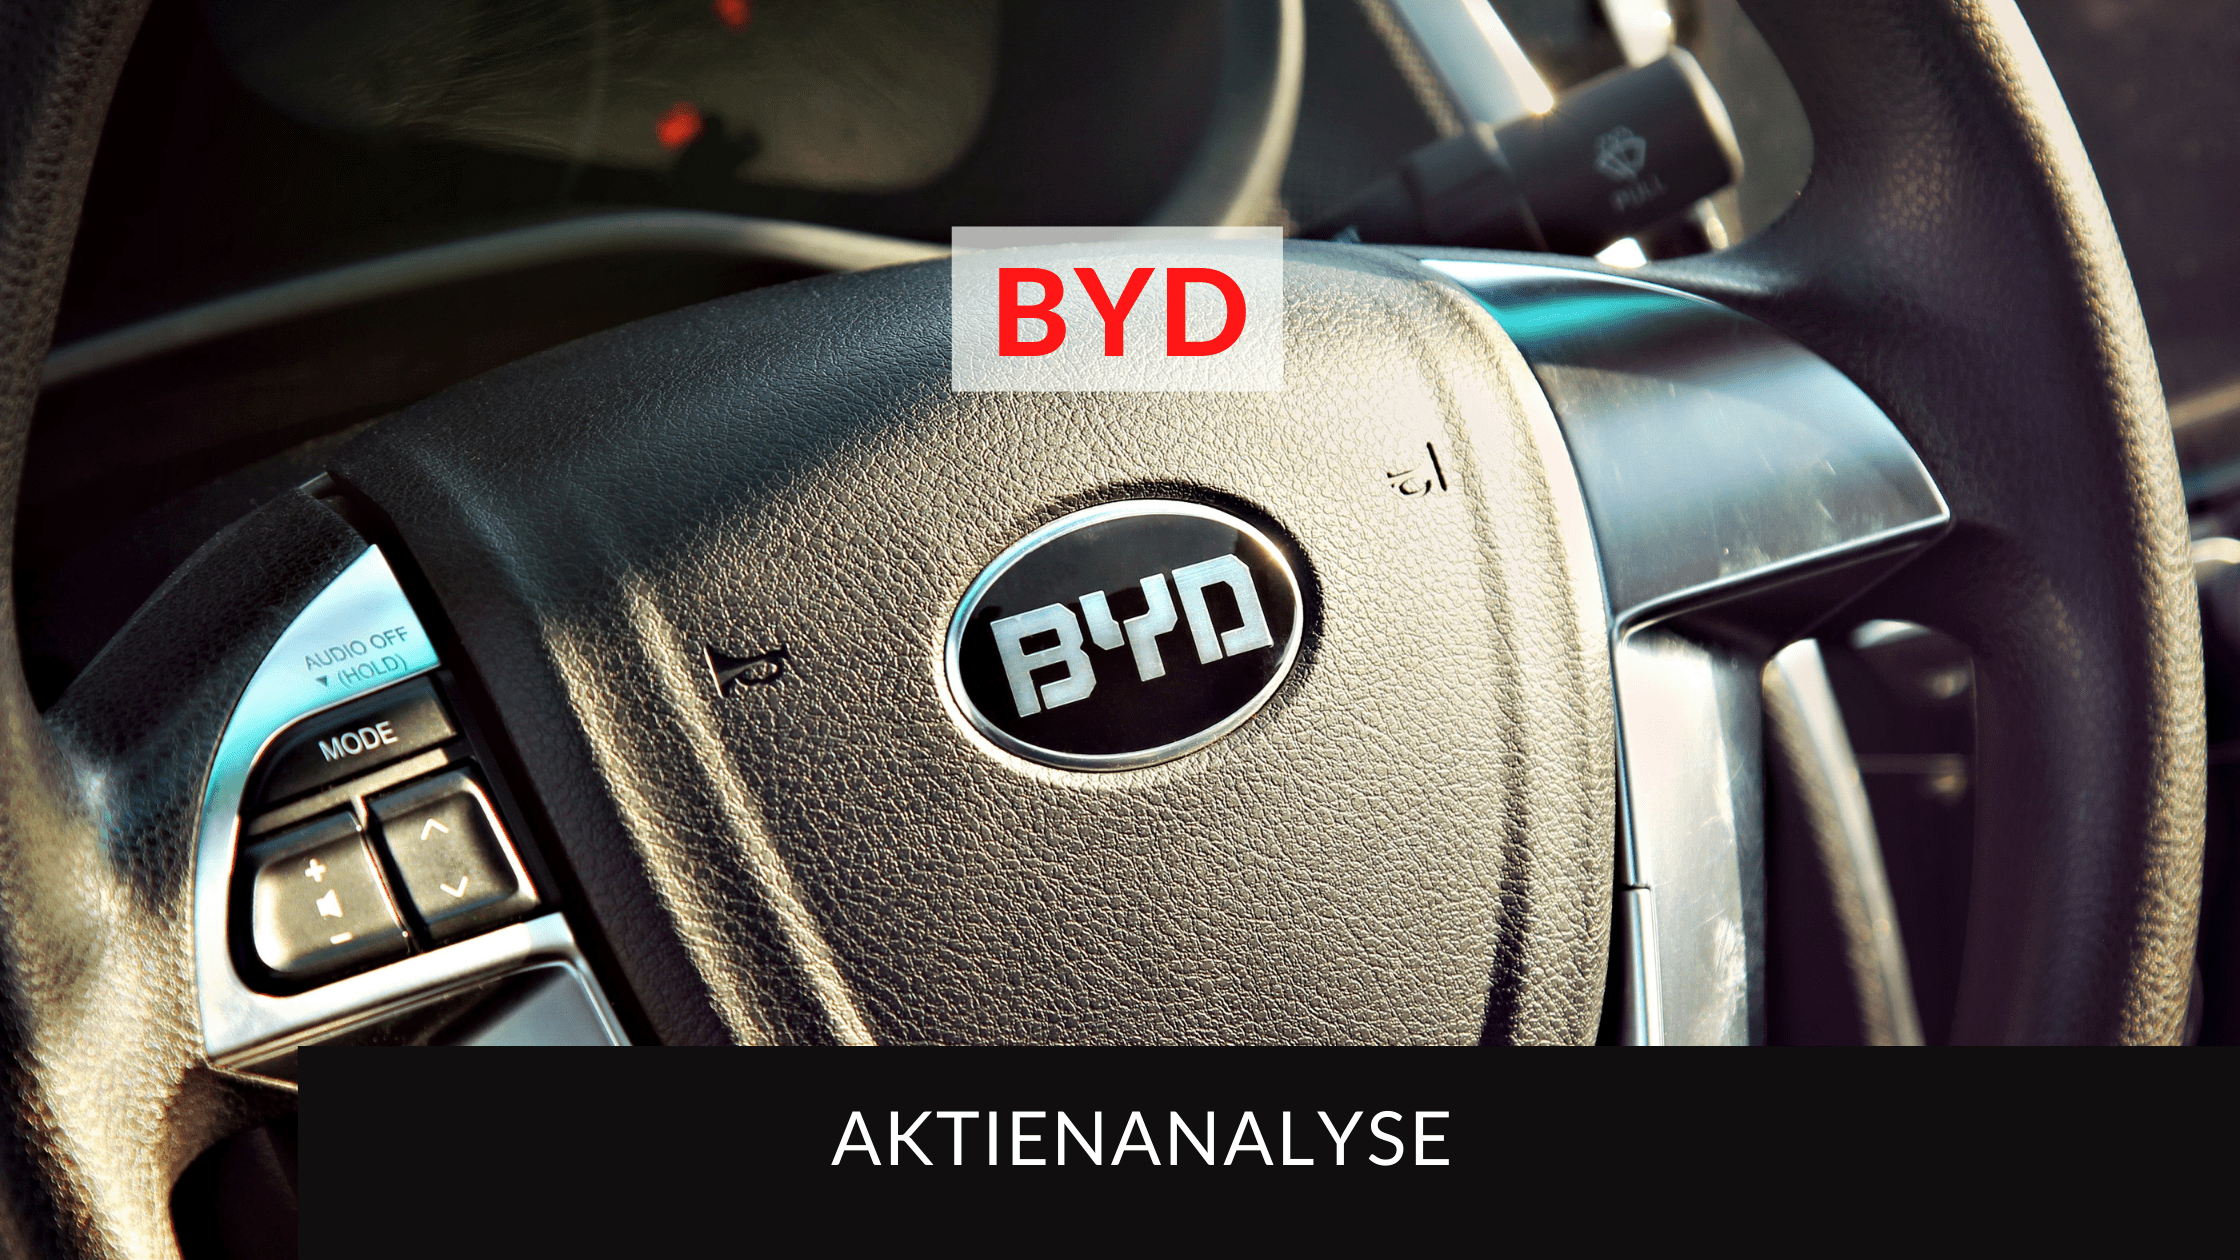 BYD Aktienanalyse